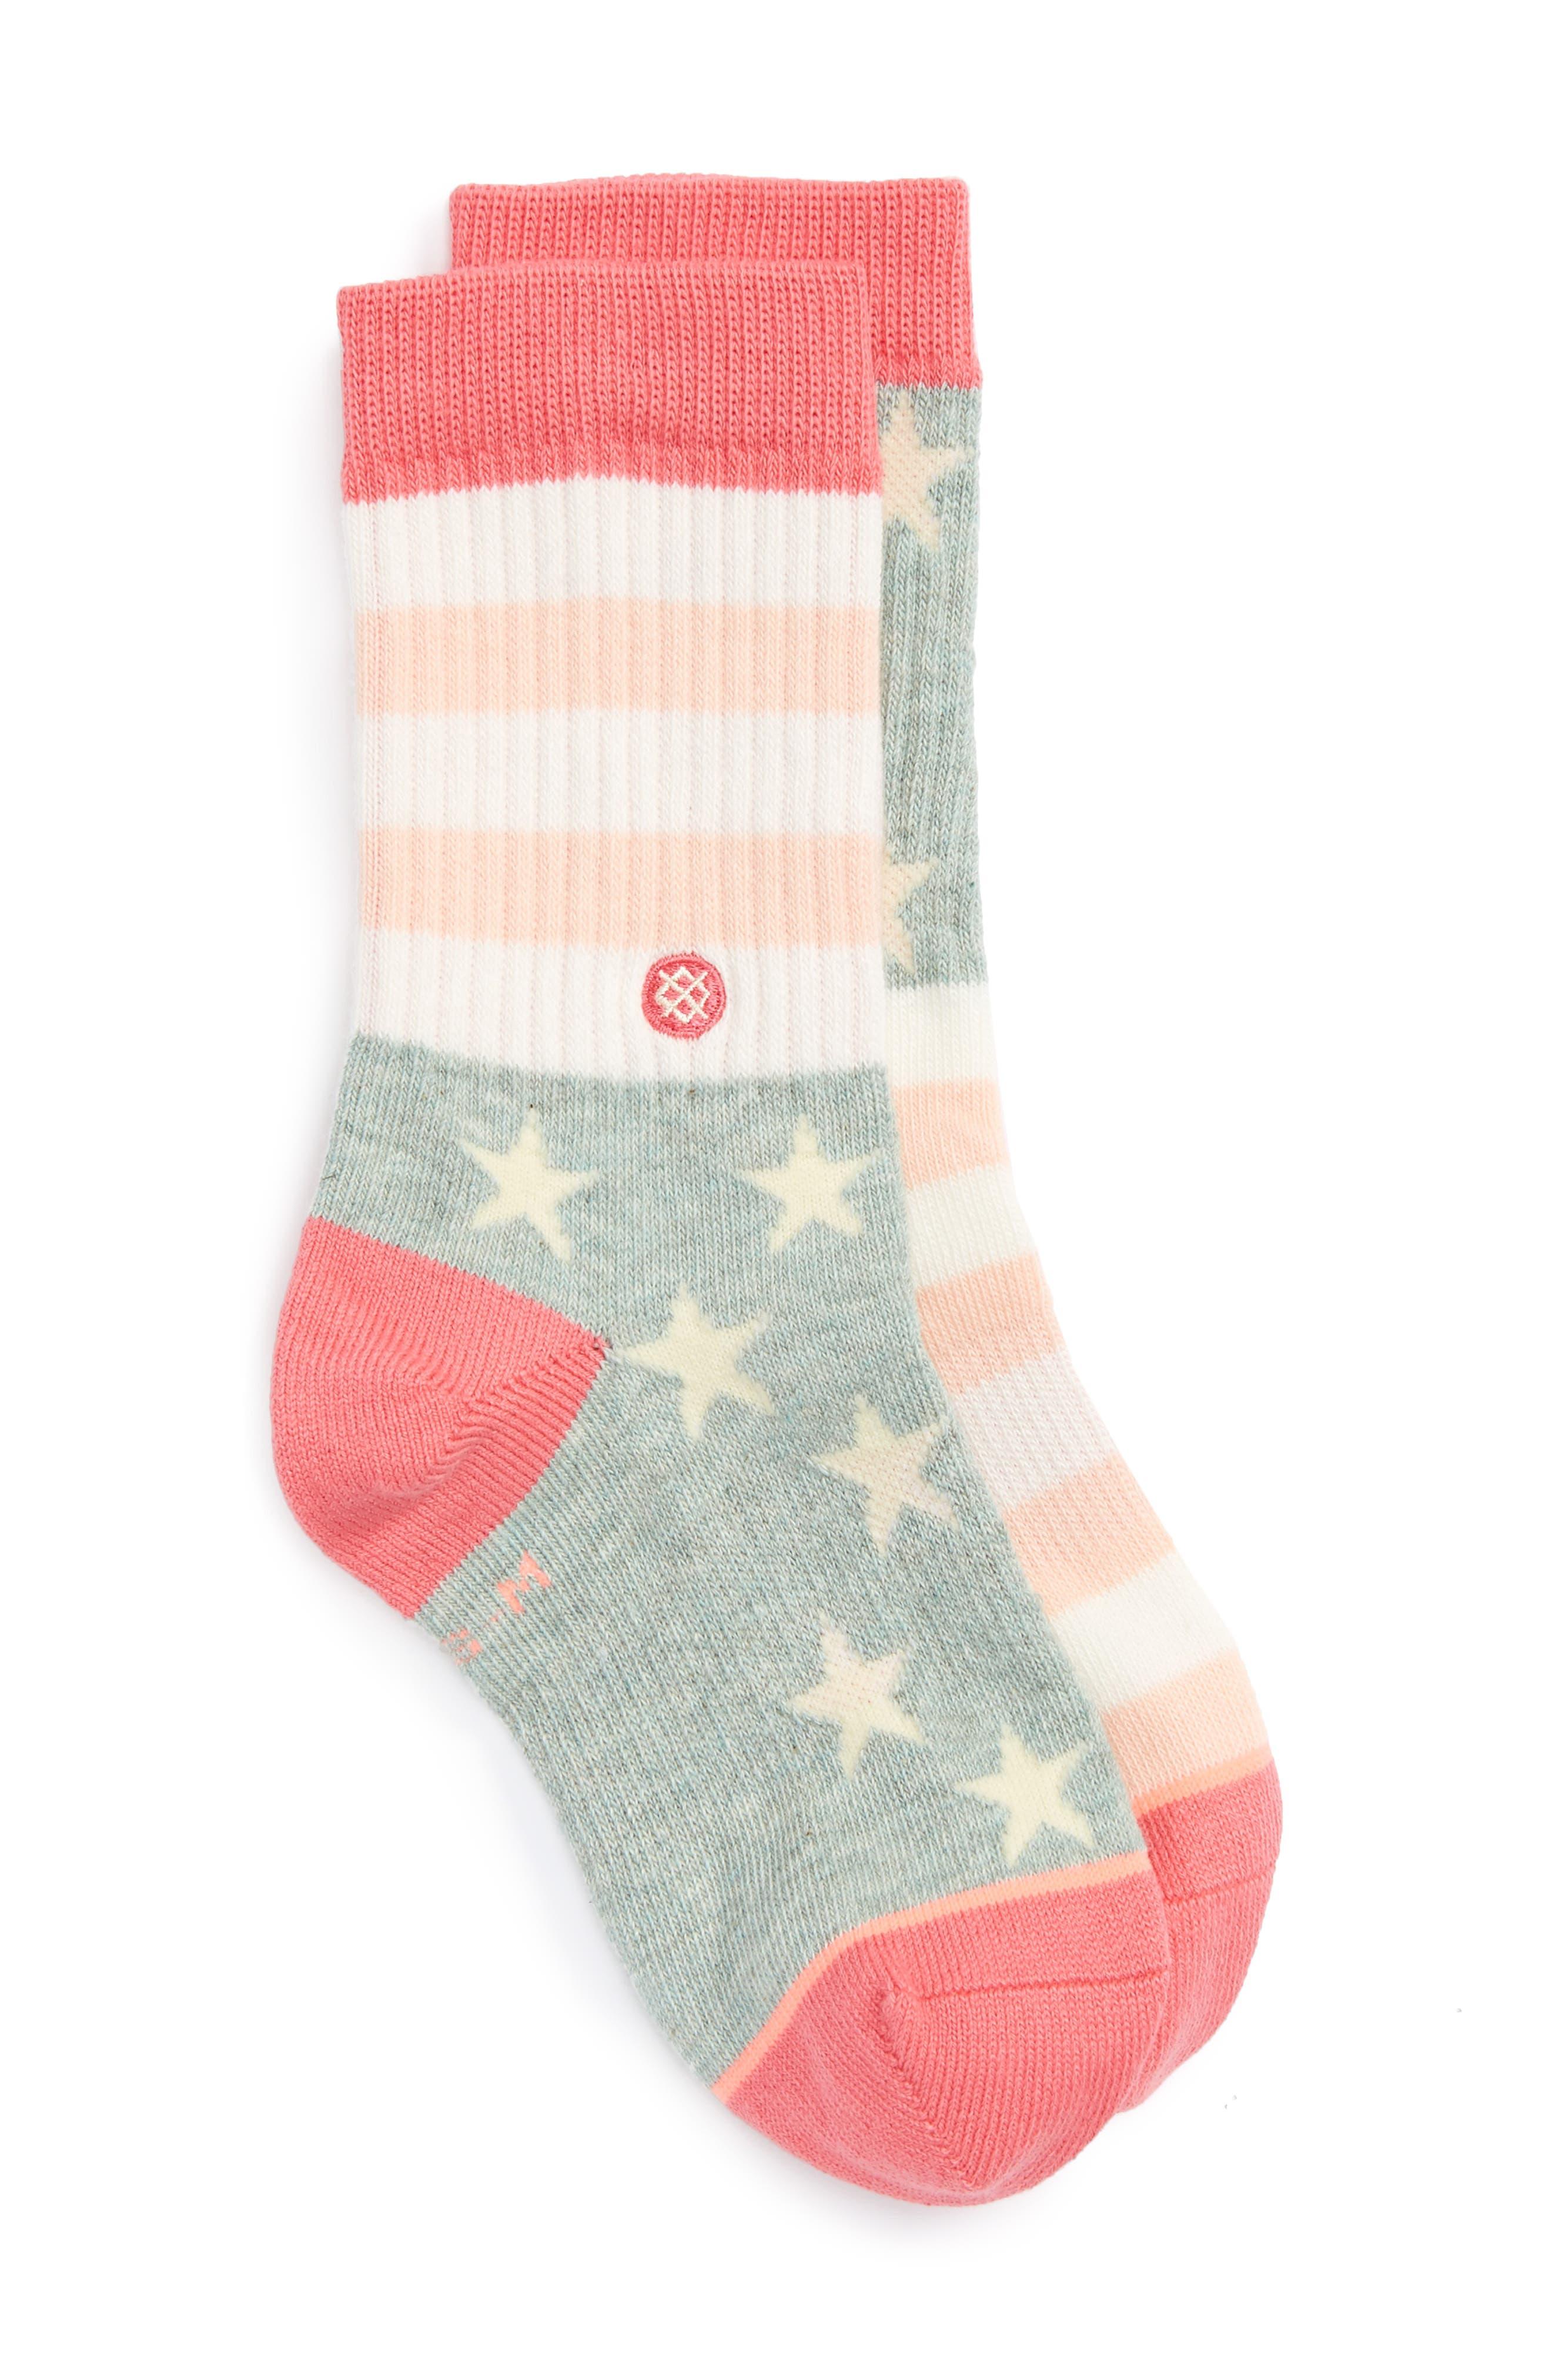 Main Image - Stance Liberty Socks (Baby & Toddler)